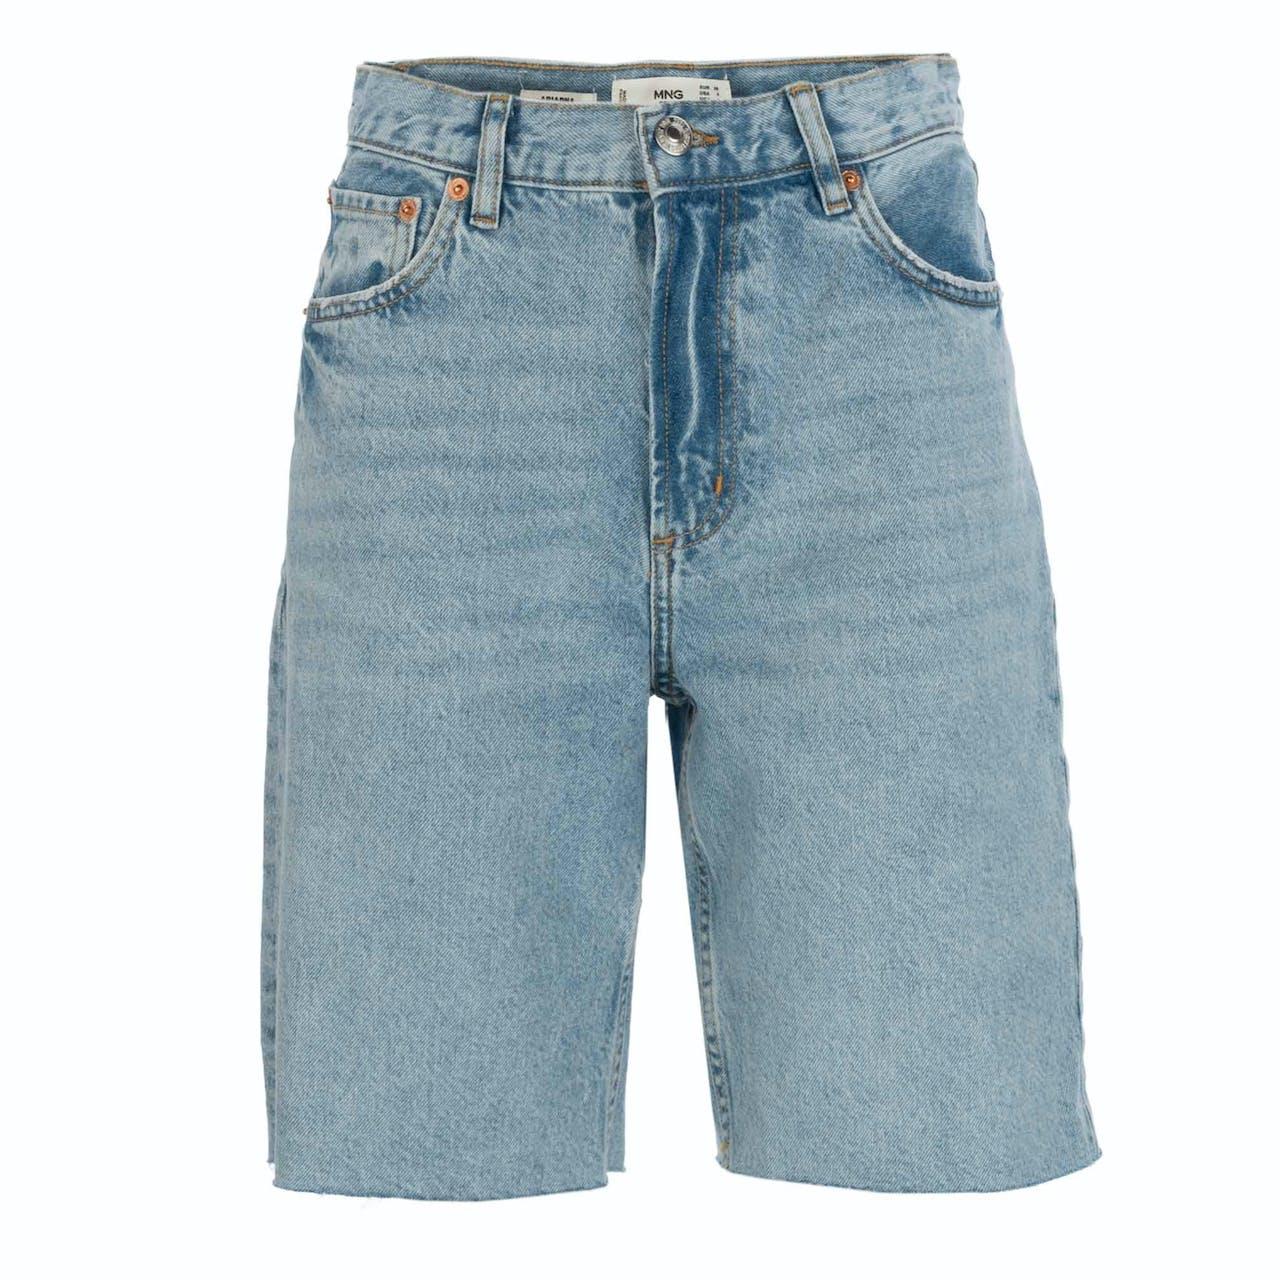 Shorts - Regular Fit -  Ariadna